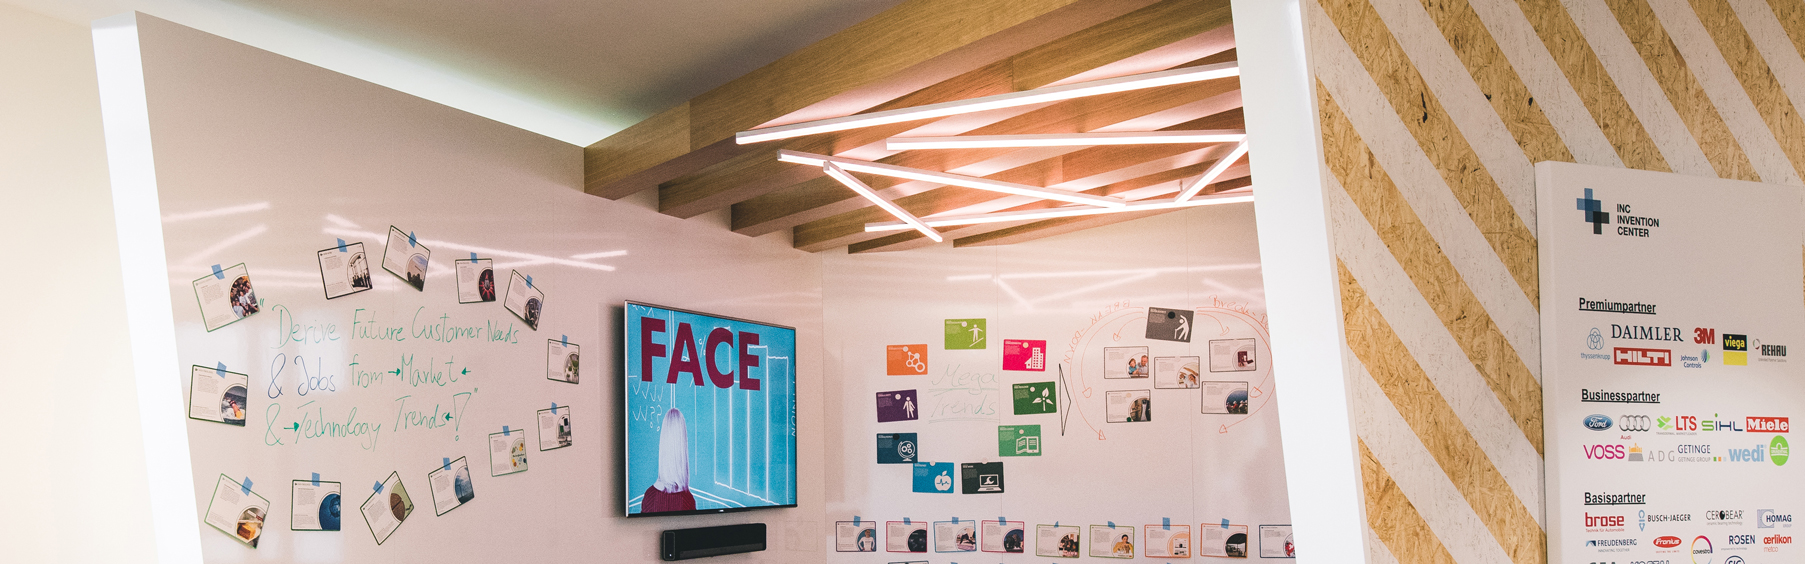 Braunwagner Interior Spatial Design INC Invention Center RWTH Aachen 2017